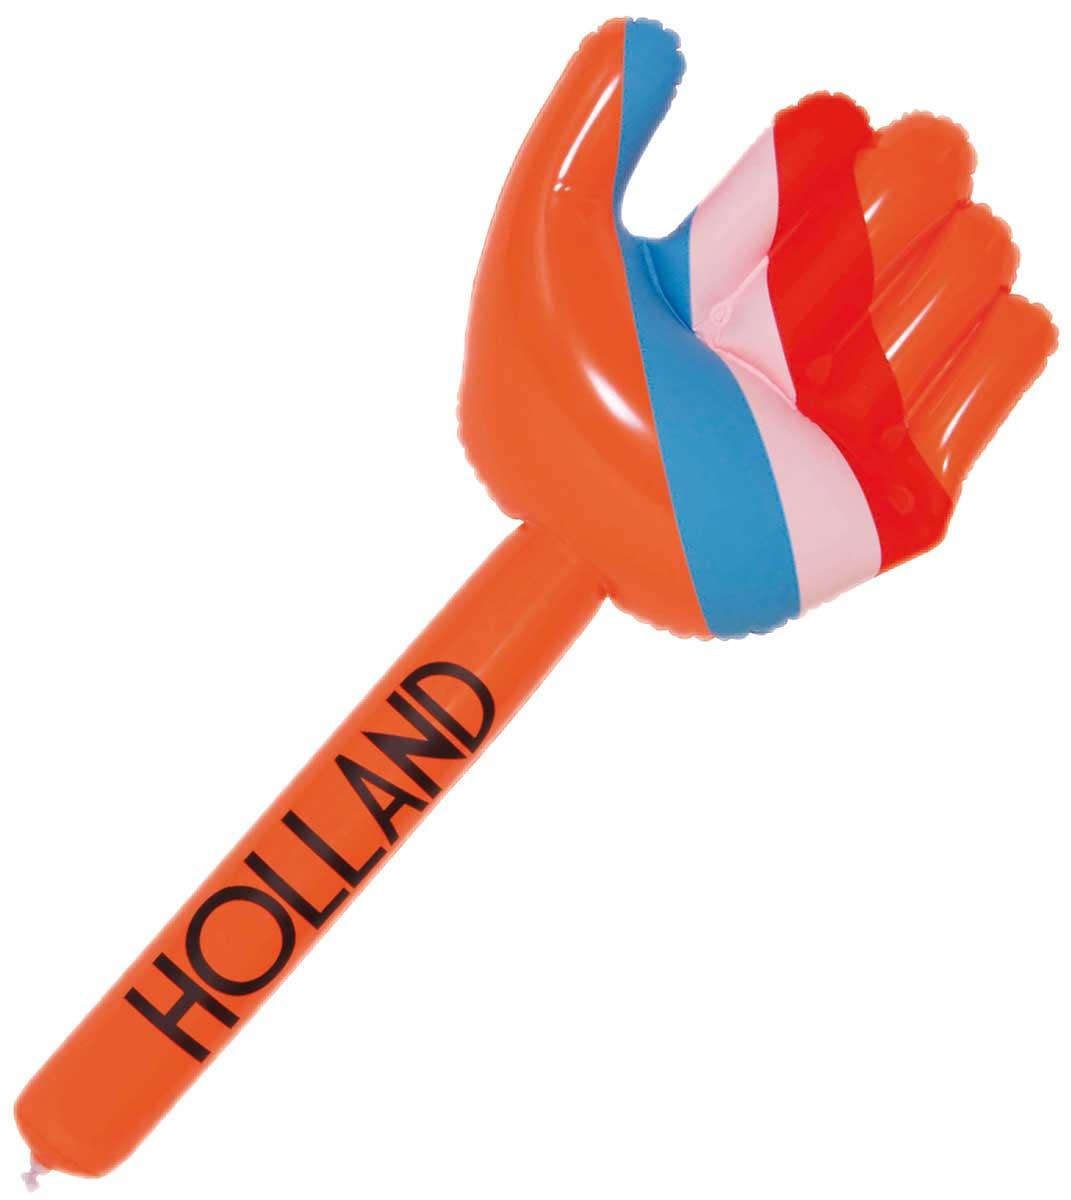 Opblaas hand Oranje-Rood-Wit-Blauw